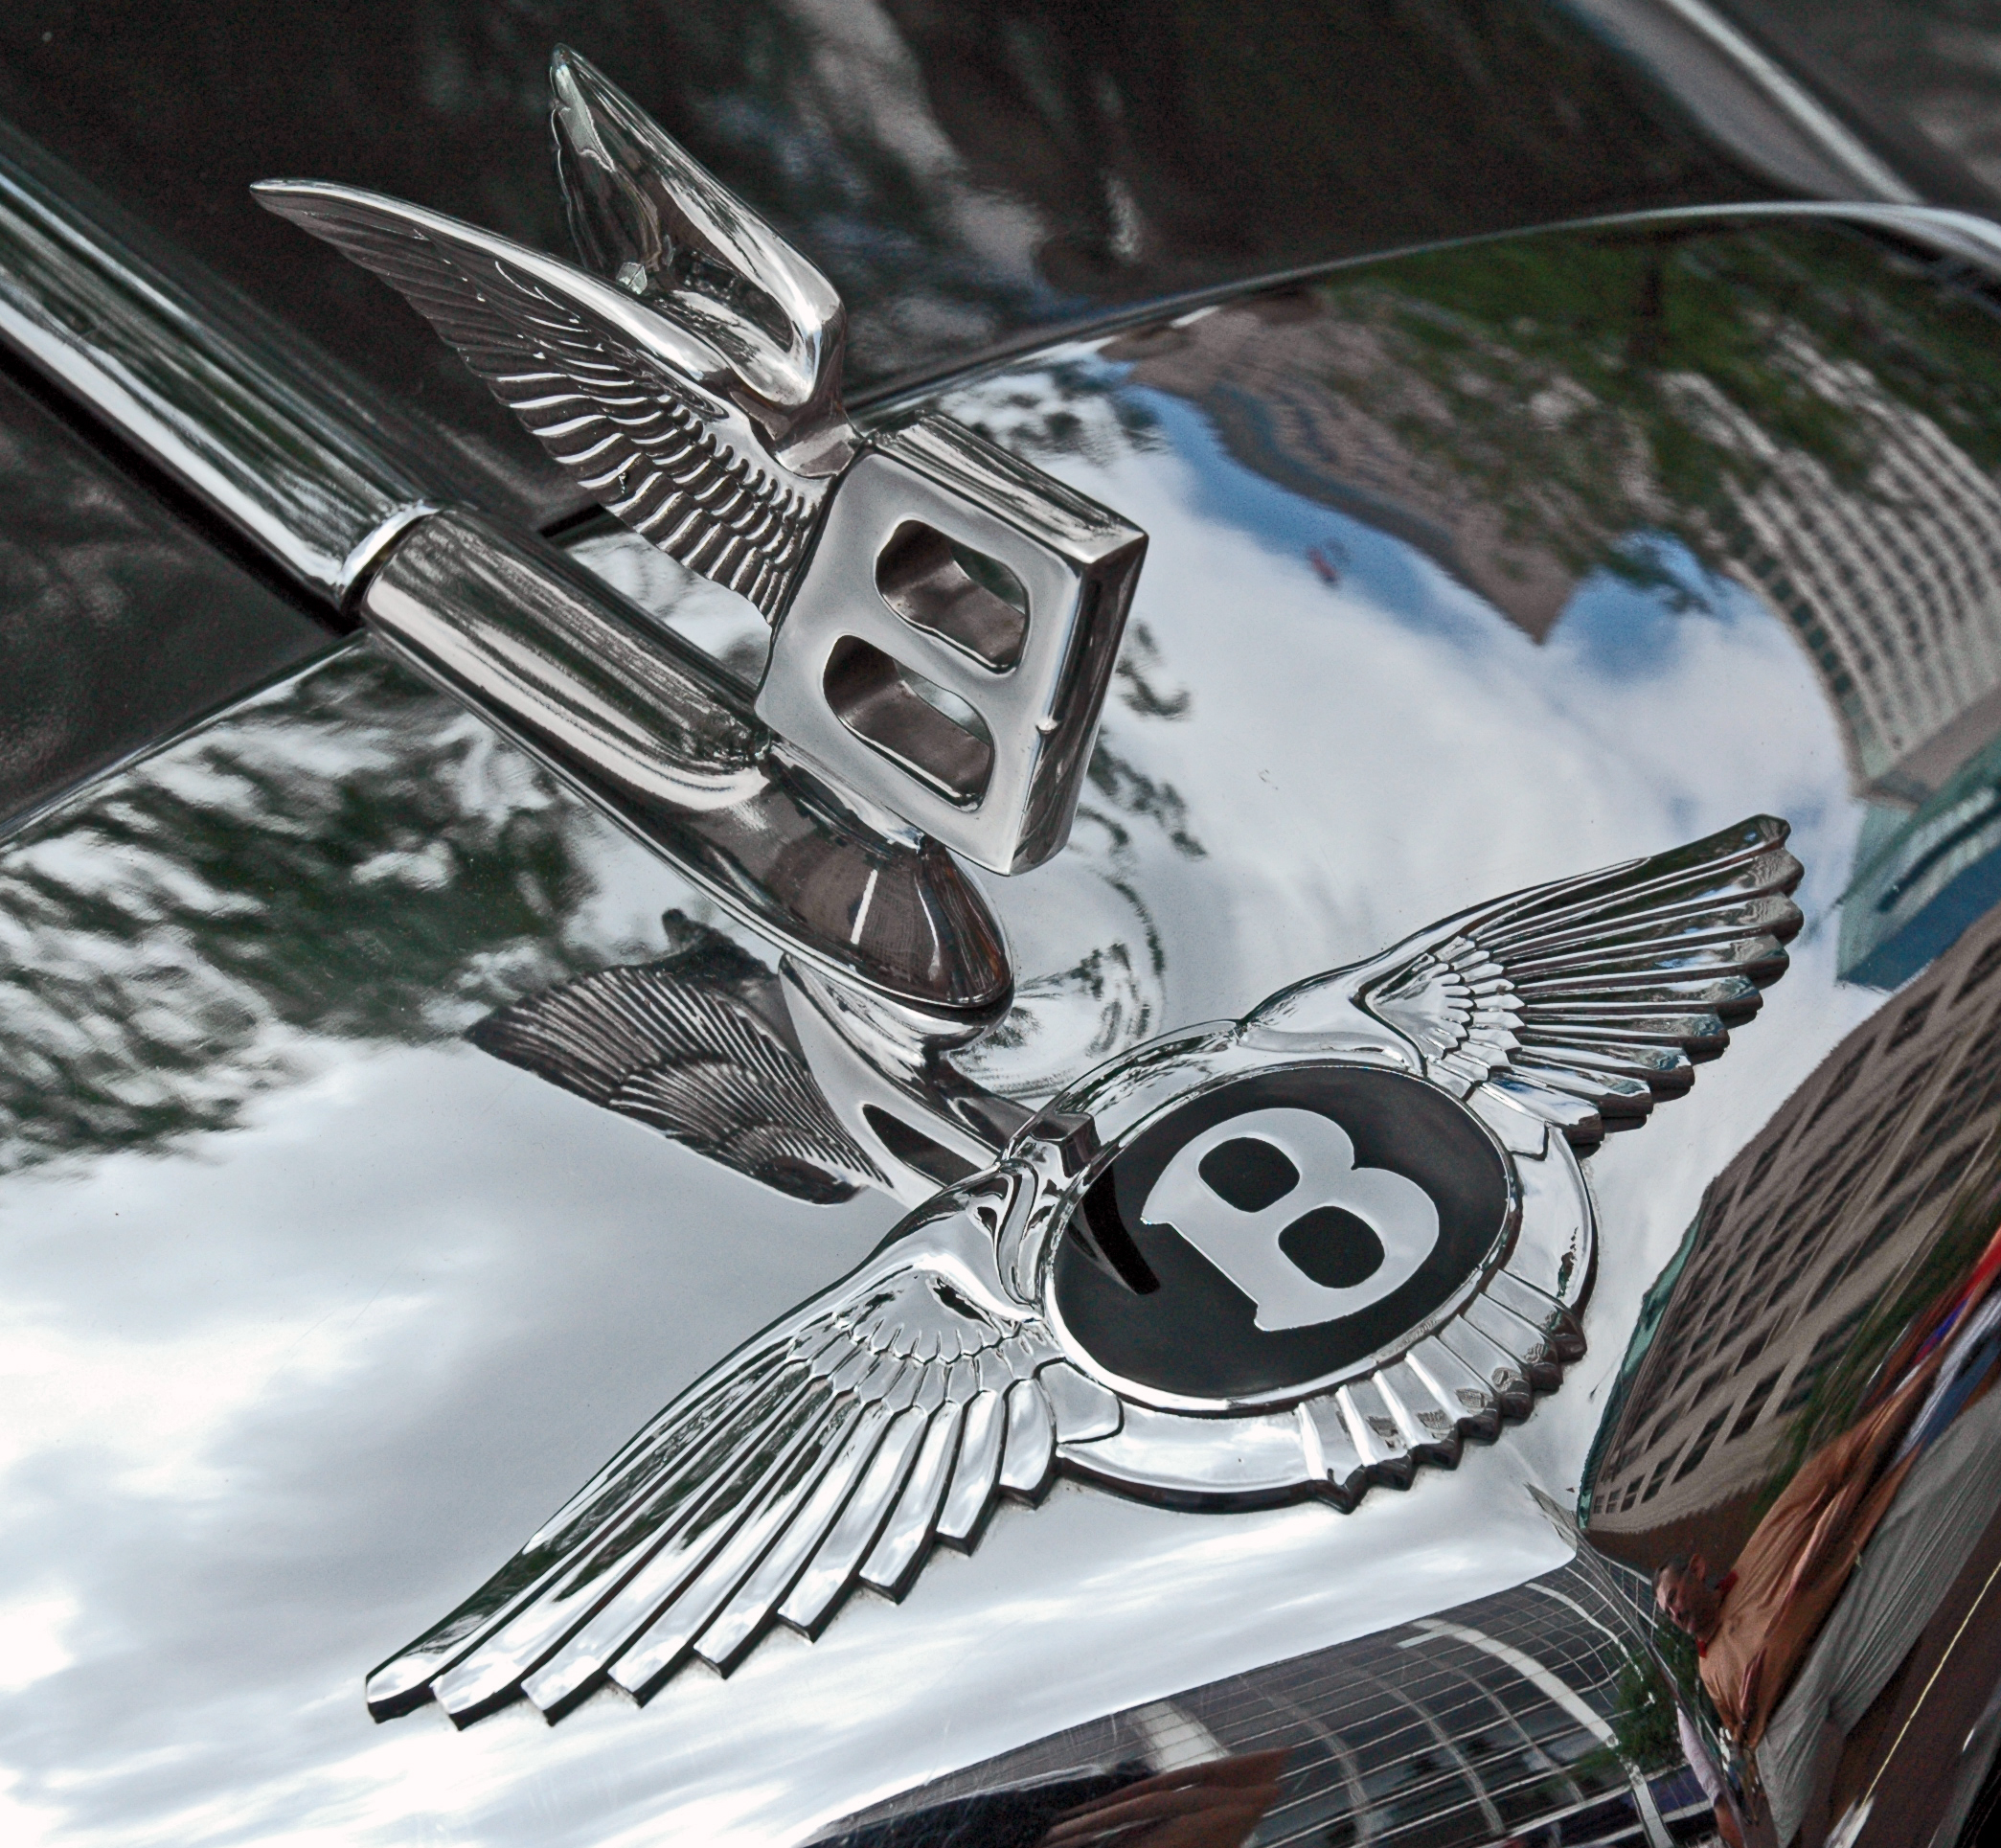 File:Bentley Badge And Hood Ornament.jpg